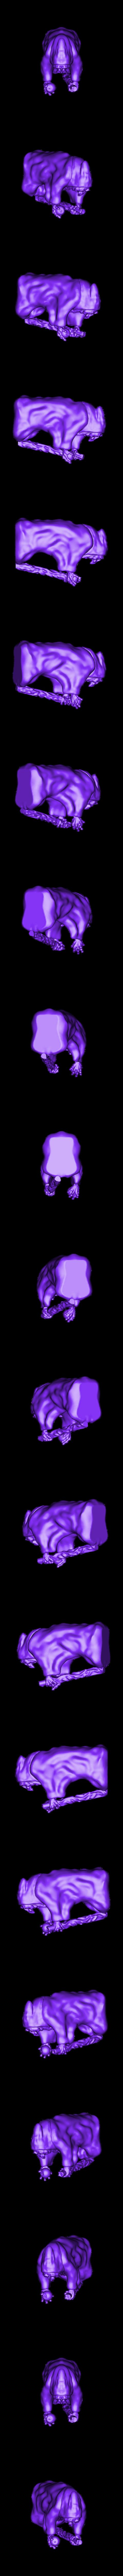 EvilQuuenWitch.stl Download free STL file Dwarfs - Evil Queen Witch • Design to 3D print, quangdo1700